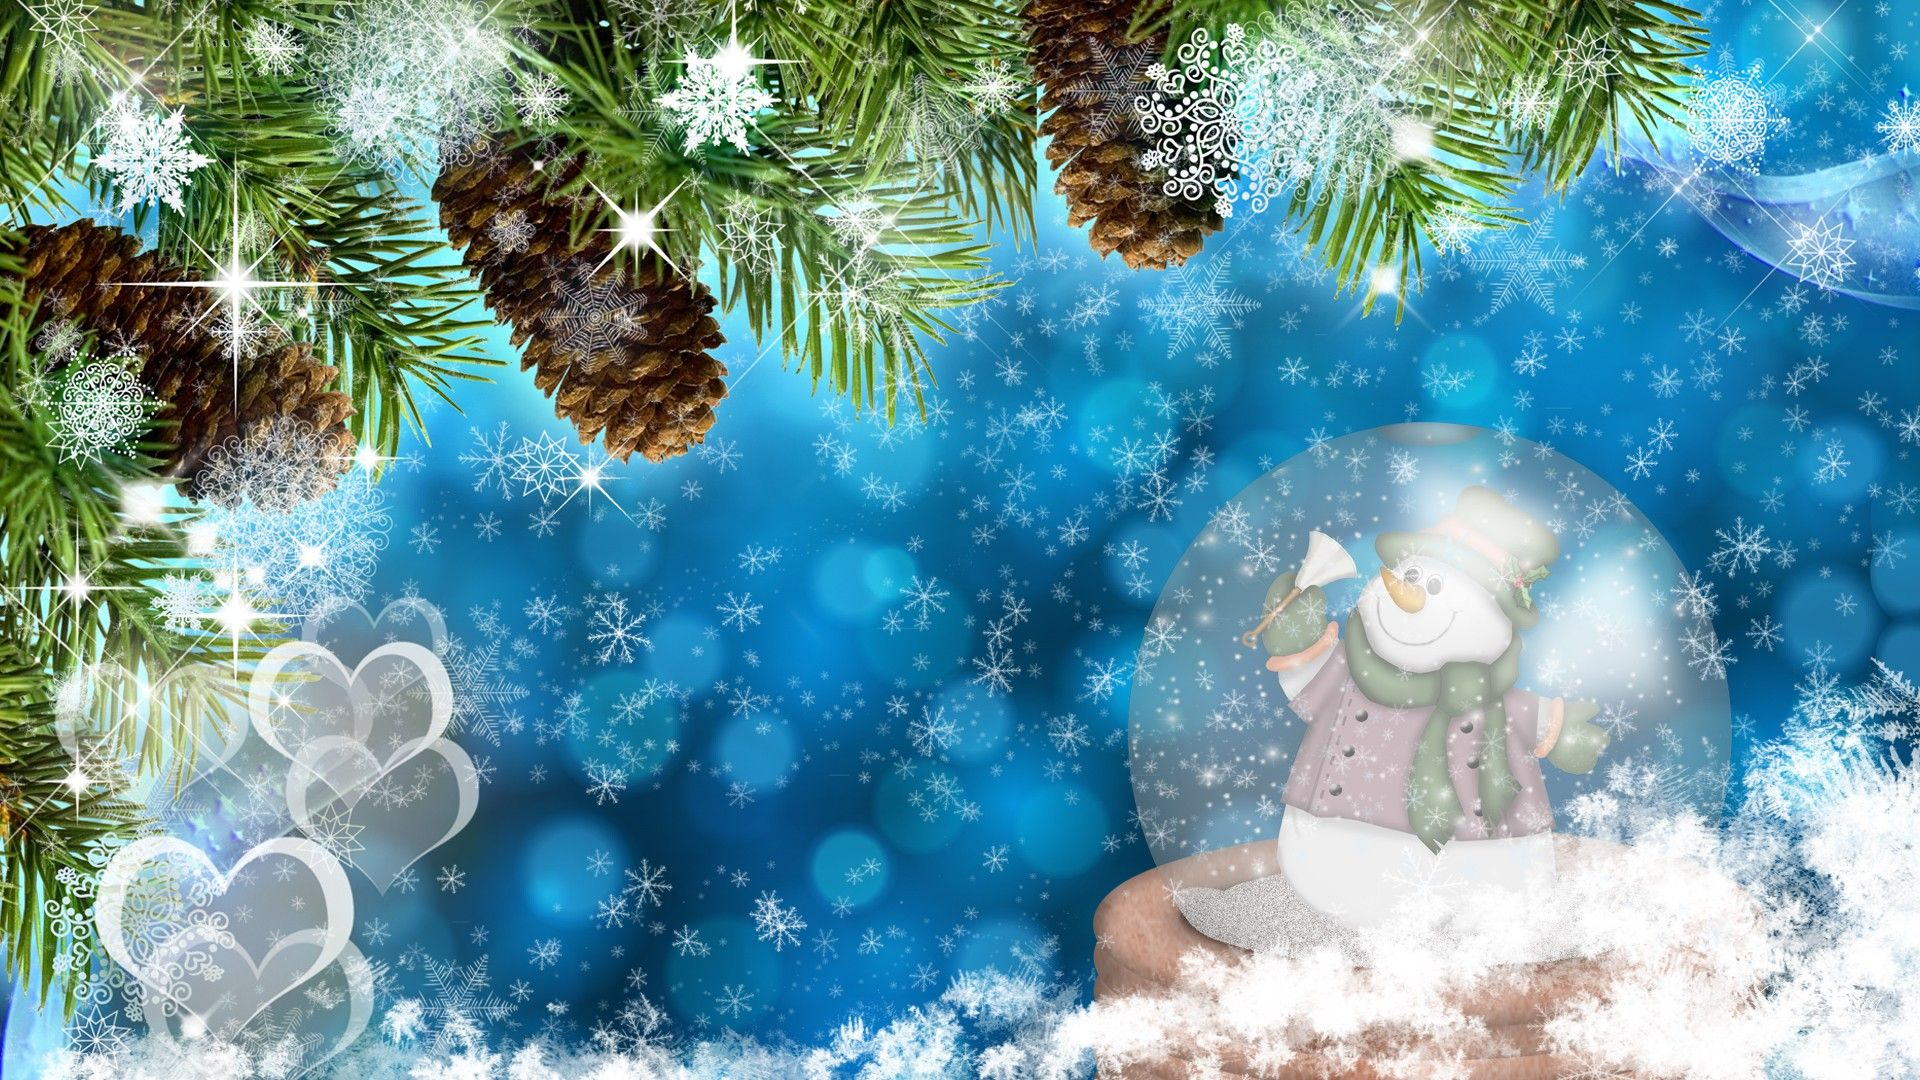 Snowman Christmas Desktop Wallpaper Holiday Wallpaper Globe Wallpaper